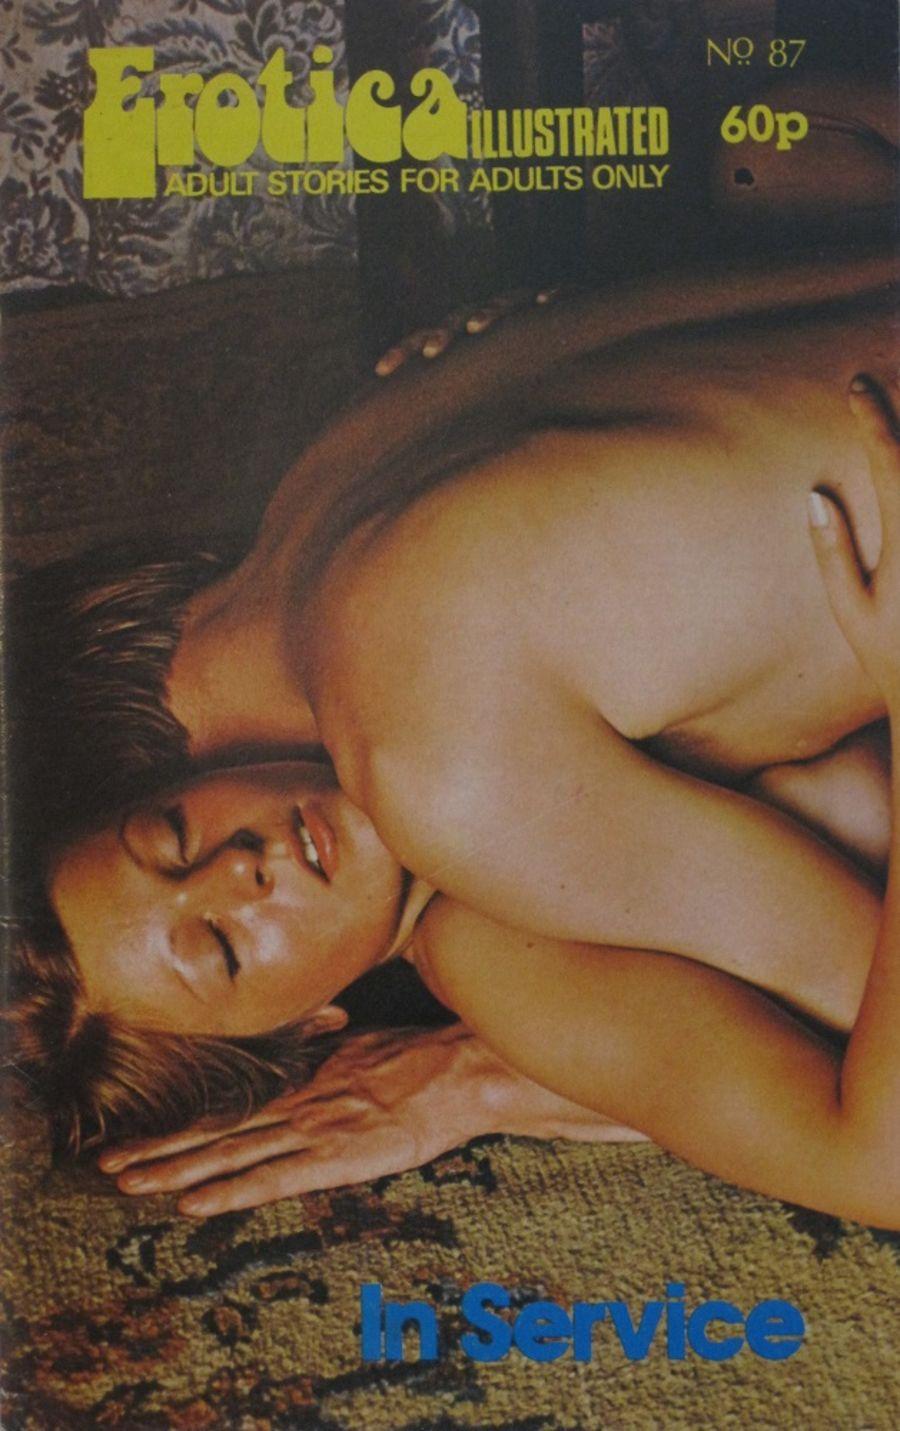 EROTICA ILLUSTRATED.  NO. 87.  1976 VINTAGE ADULT POCKET MAGAZINE.